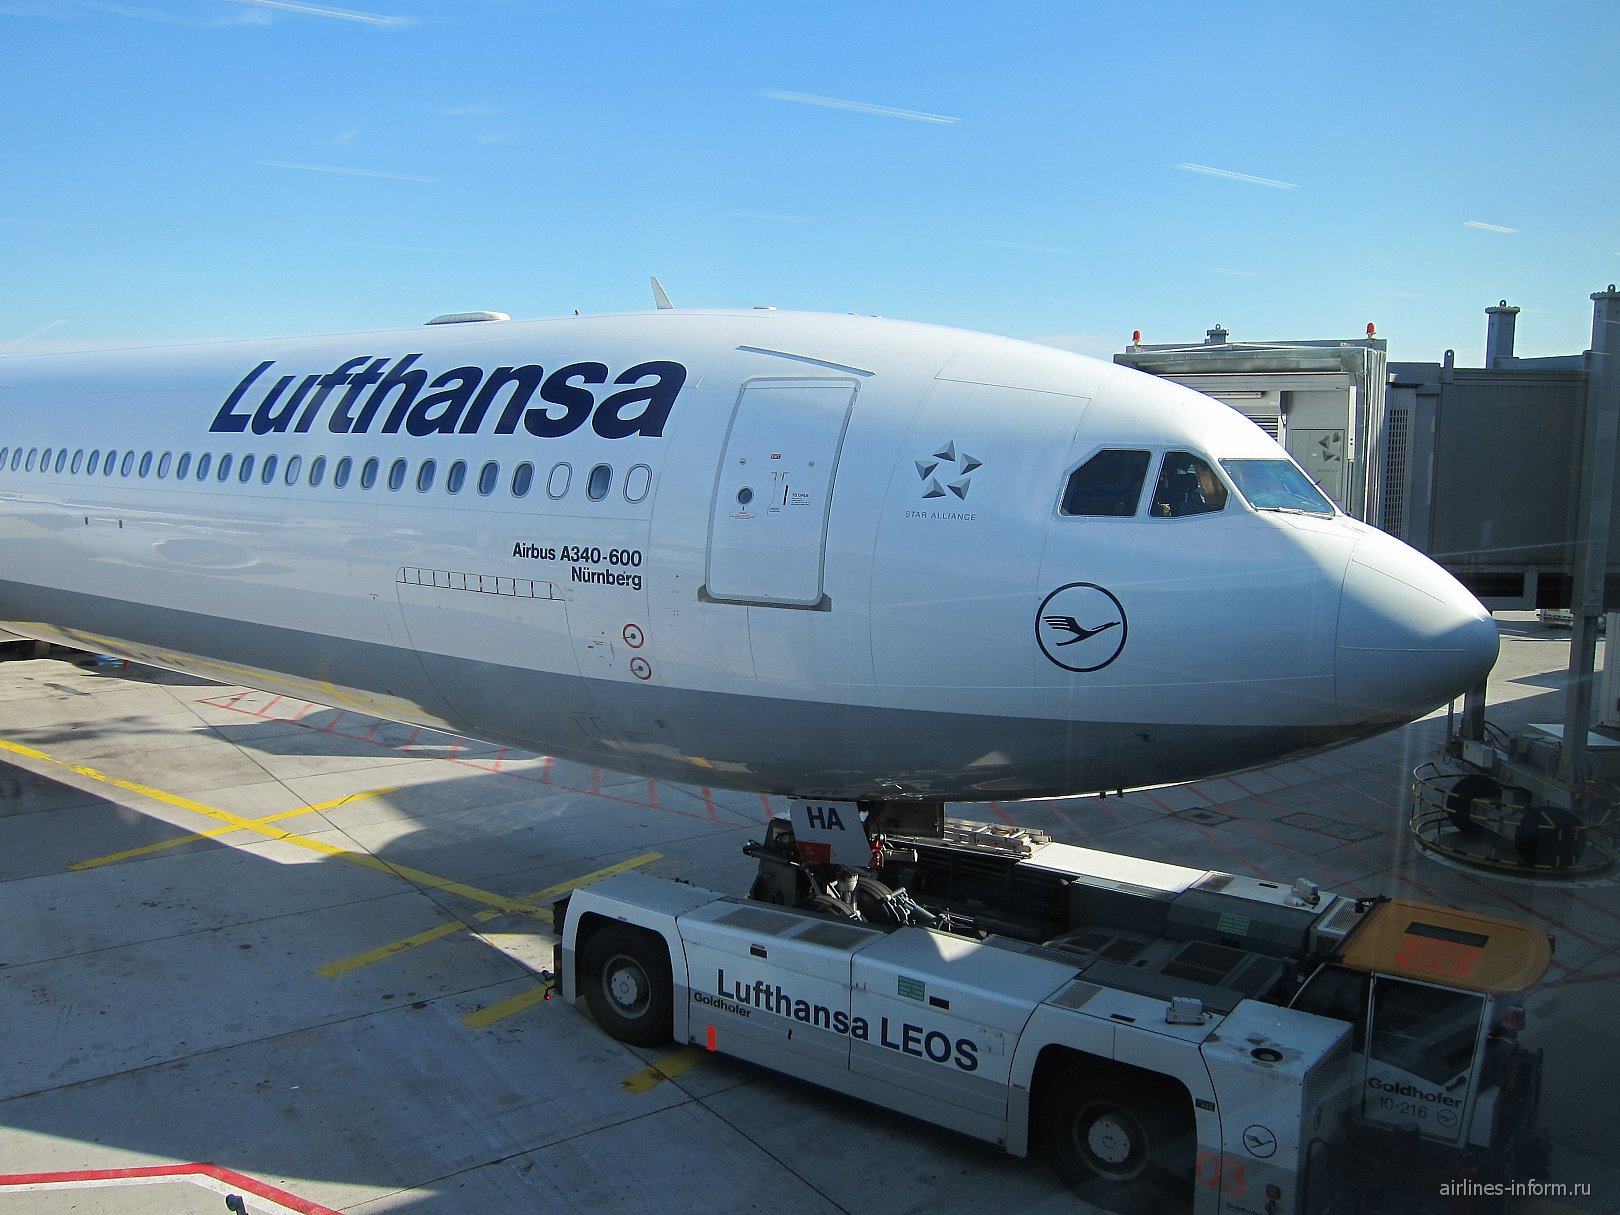 Airbus A340-600 авиакомпании Lufthansa в аэропорту Франкфурта